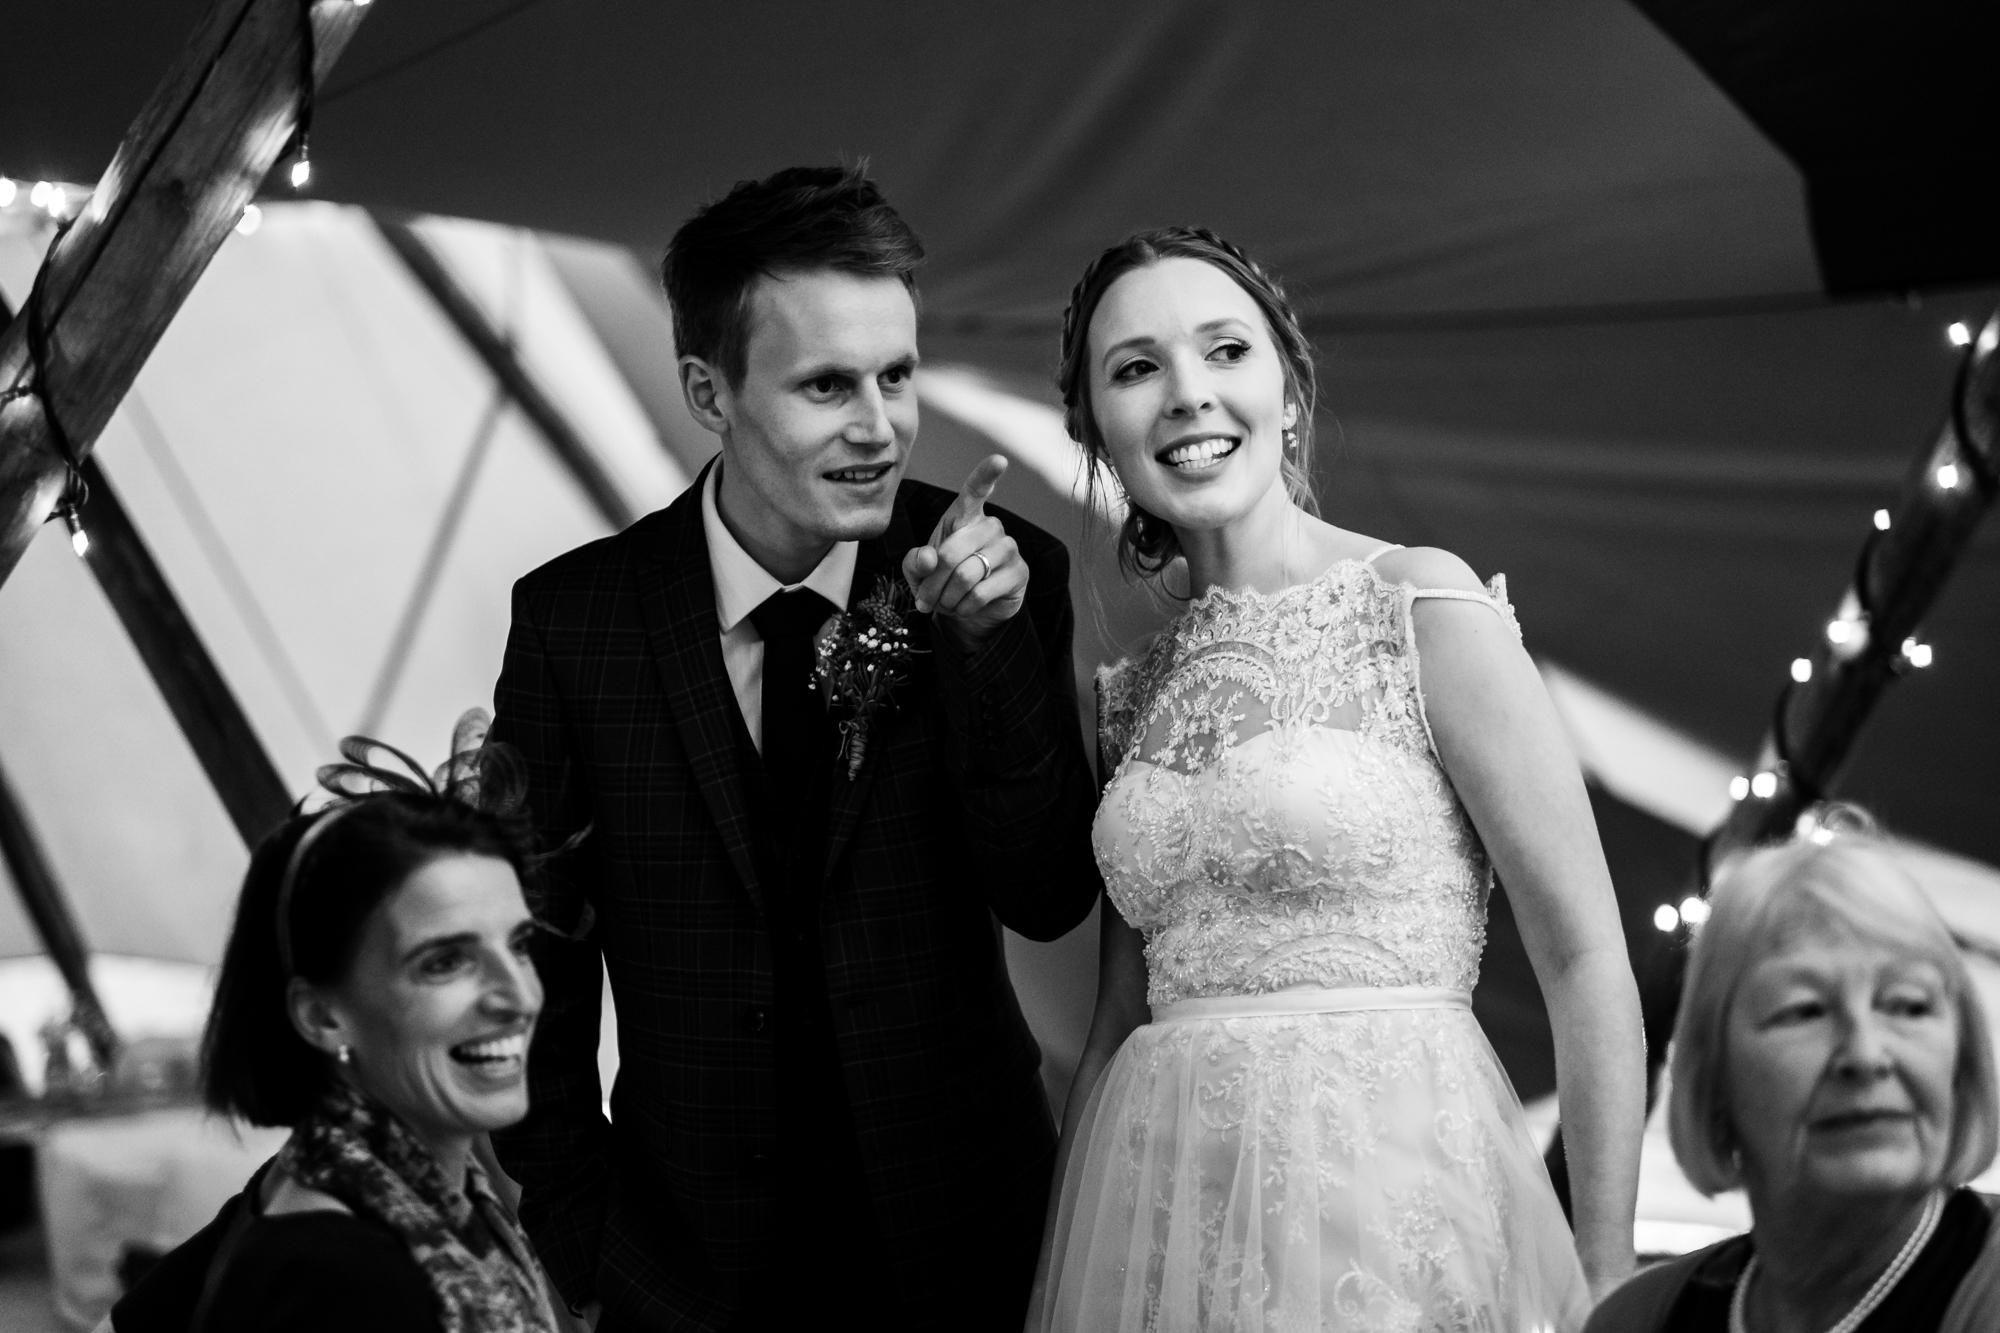 Katie and Dode weddings (144 of 207).jpg